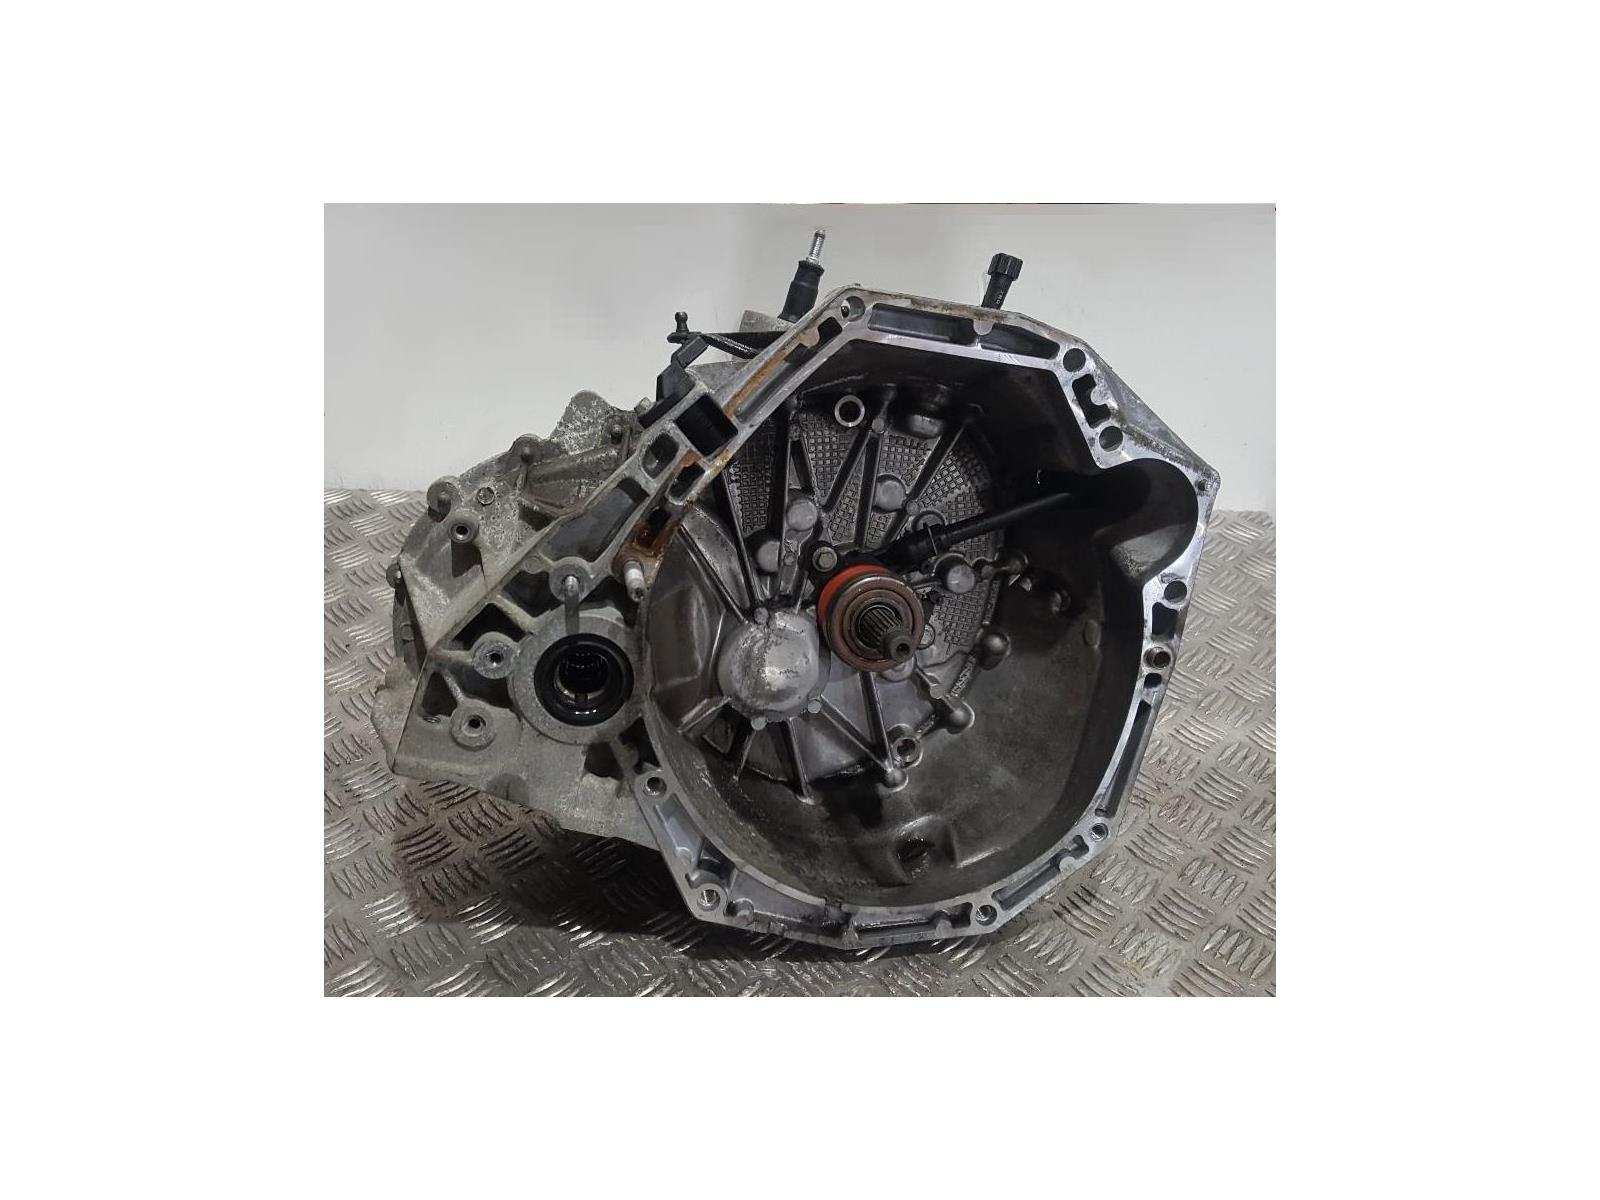 NISSAN QASHQAI DCI MK2 (J11) 2016 1.5 DIESEL 6 Speed 32010M Gearbox Assembly